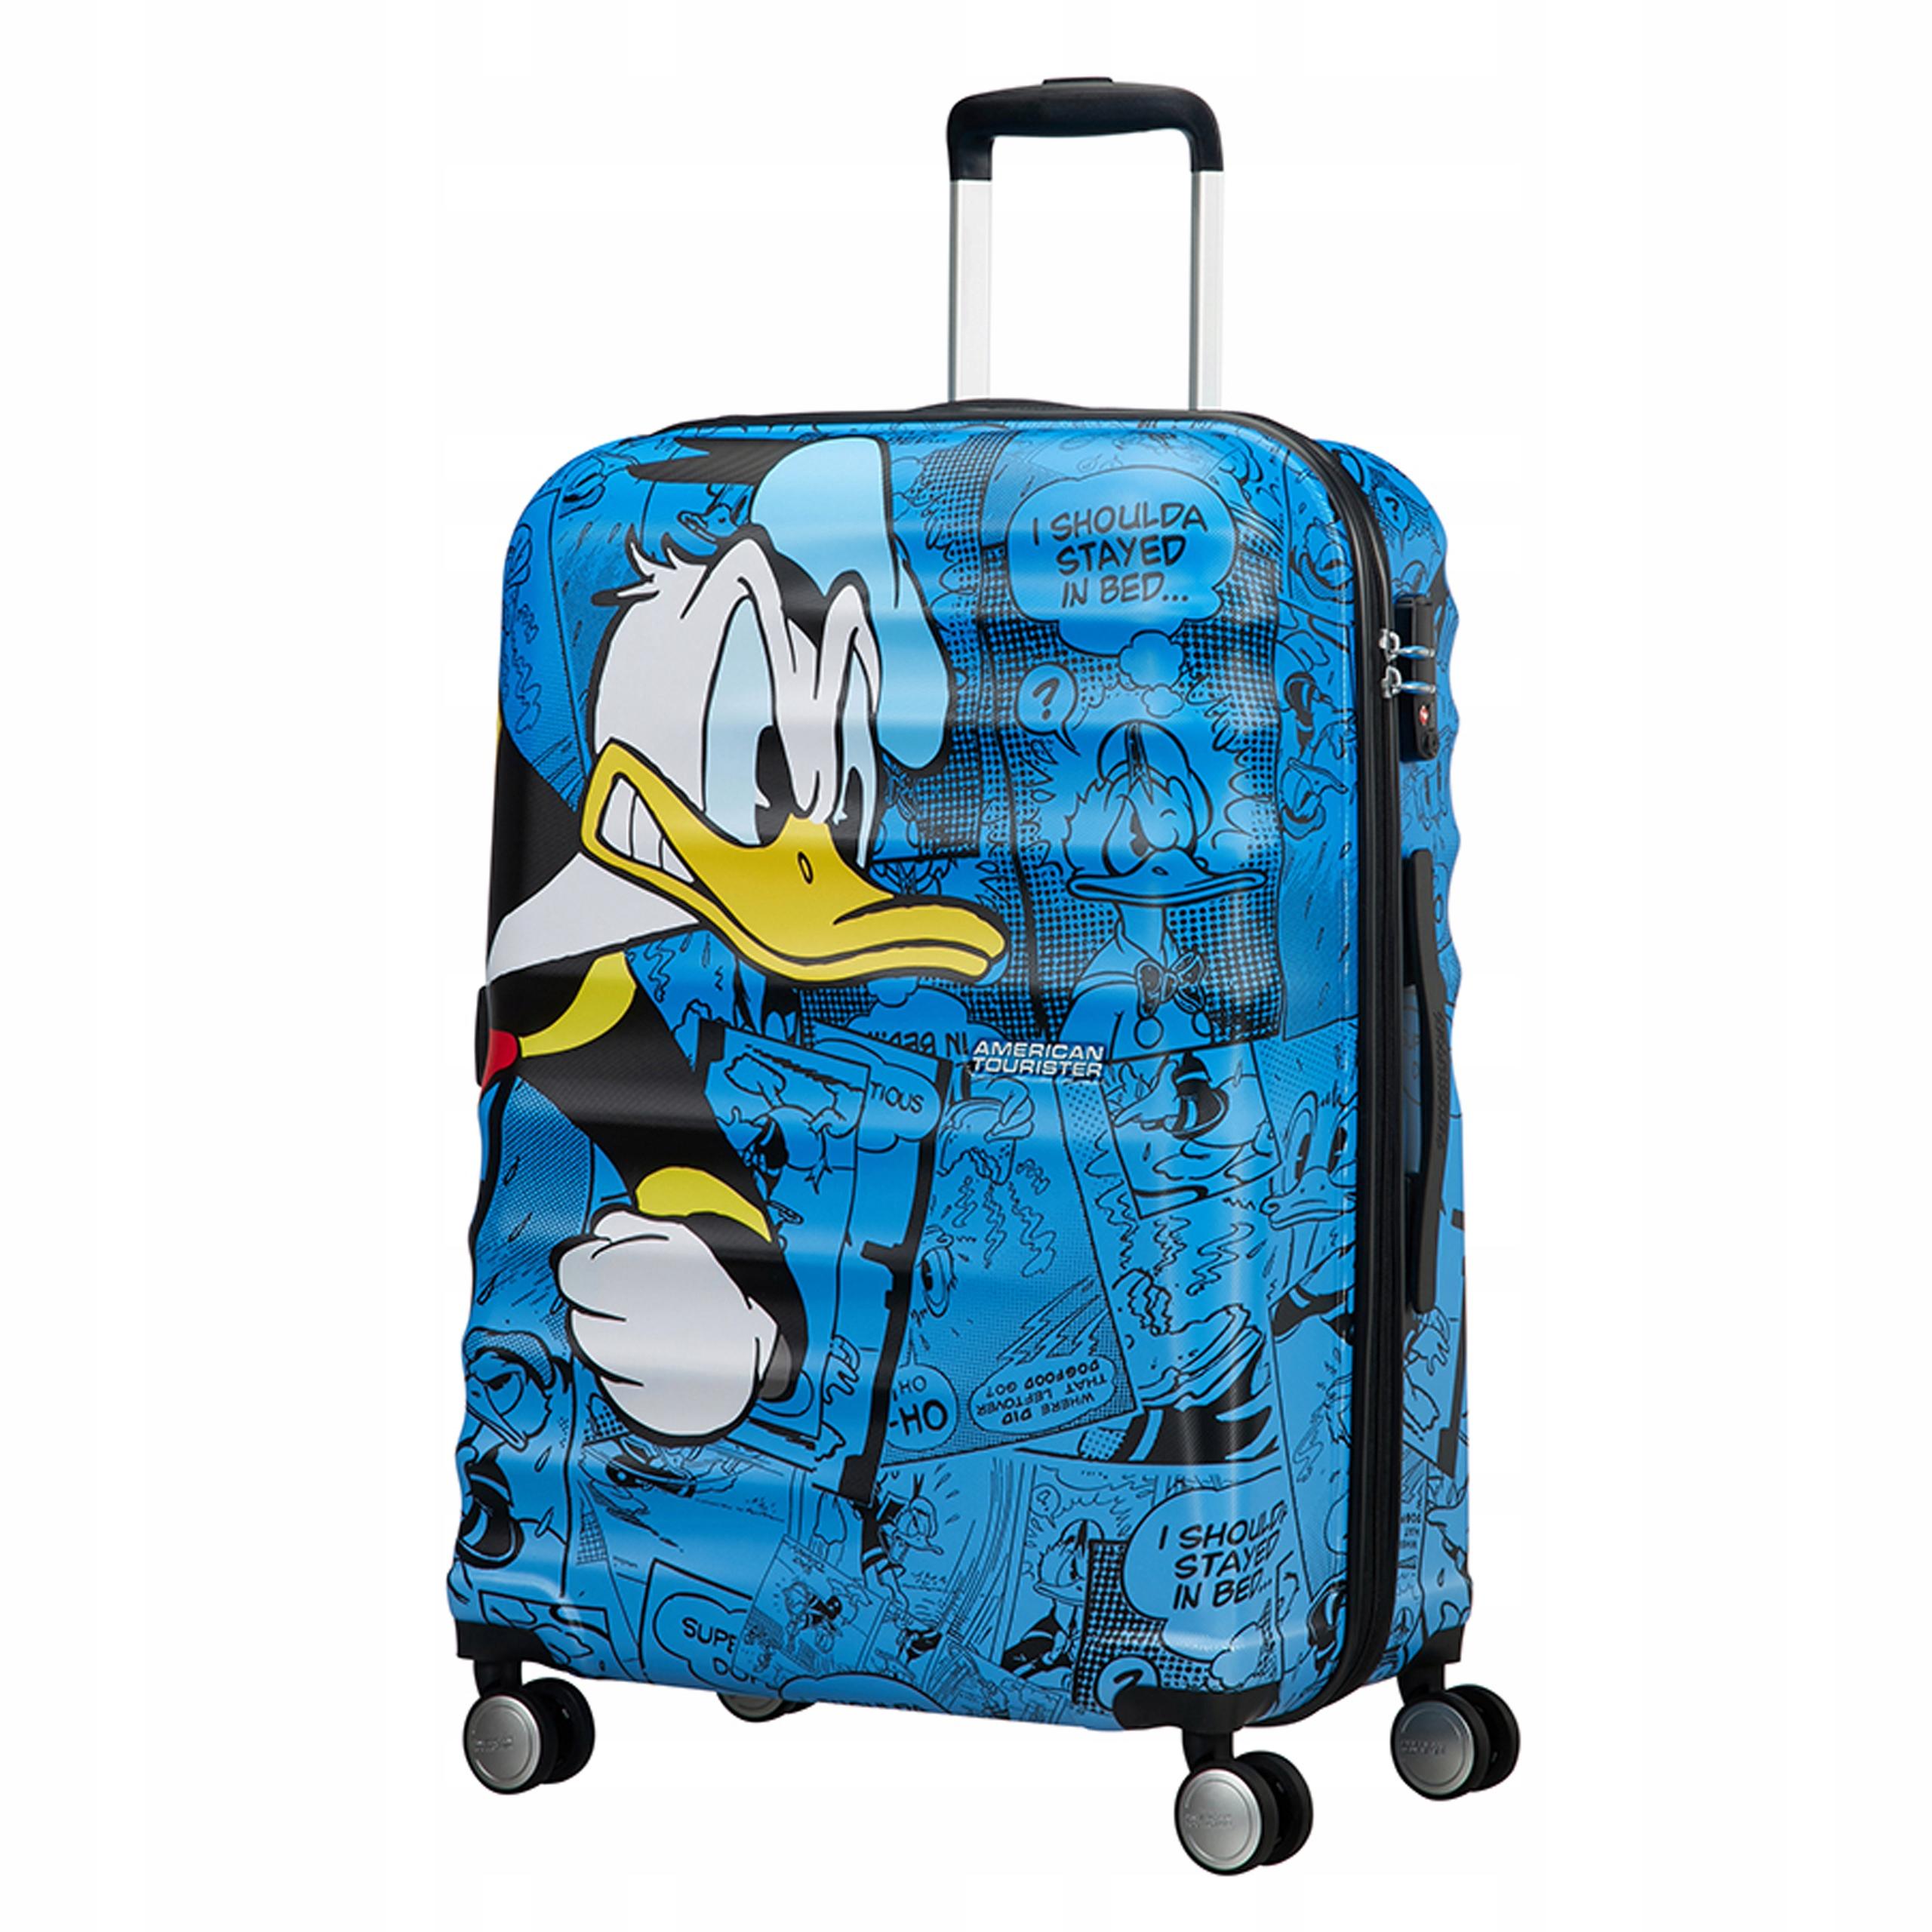 2580e0e277eb8 Walizka AMERICAN TOURISTER Disney Donald 31C01004 - 7714735171 ...